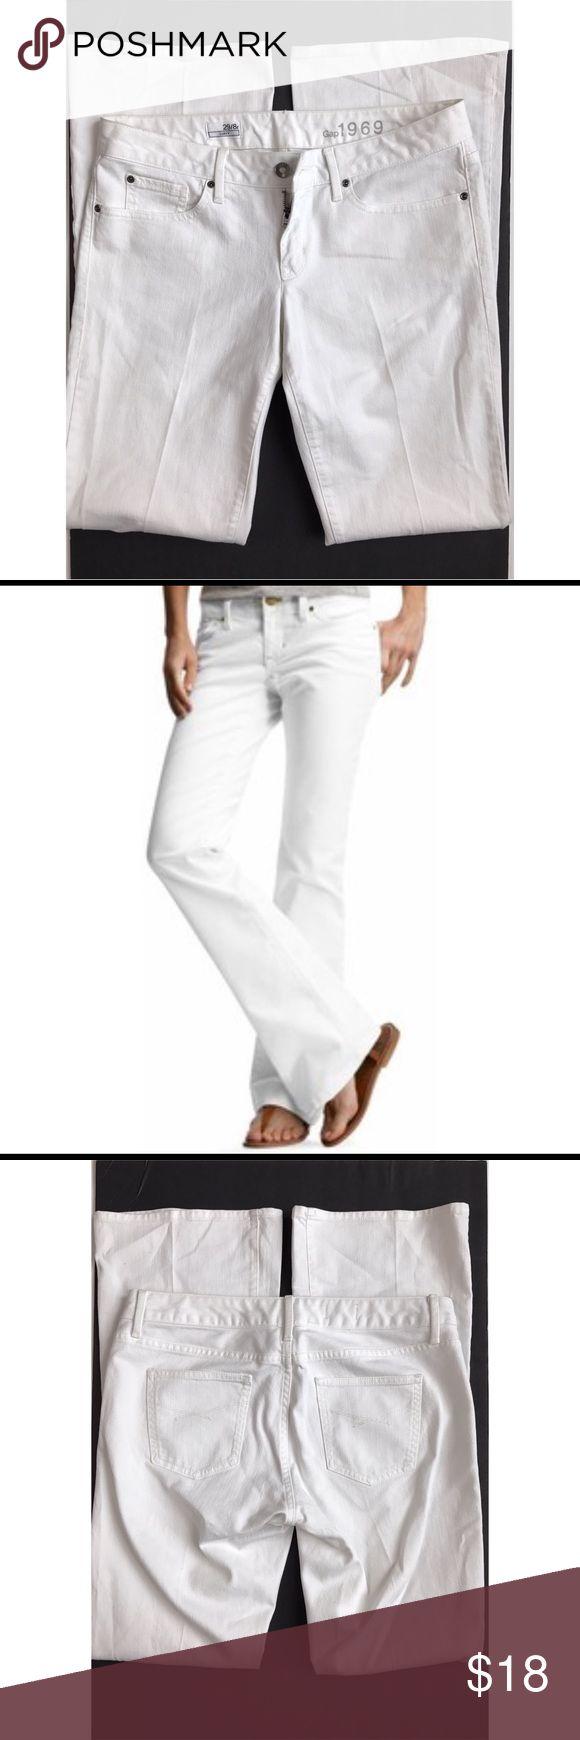 "Women's Gap 1969 Bootcut Curvy Jeans - Sz. 29/8reg A great staple to add to your summer wardrobe. Inseam: 33"" GAP Jeans Boot Cut"